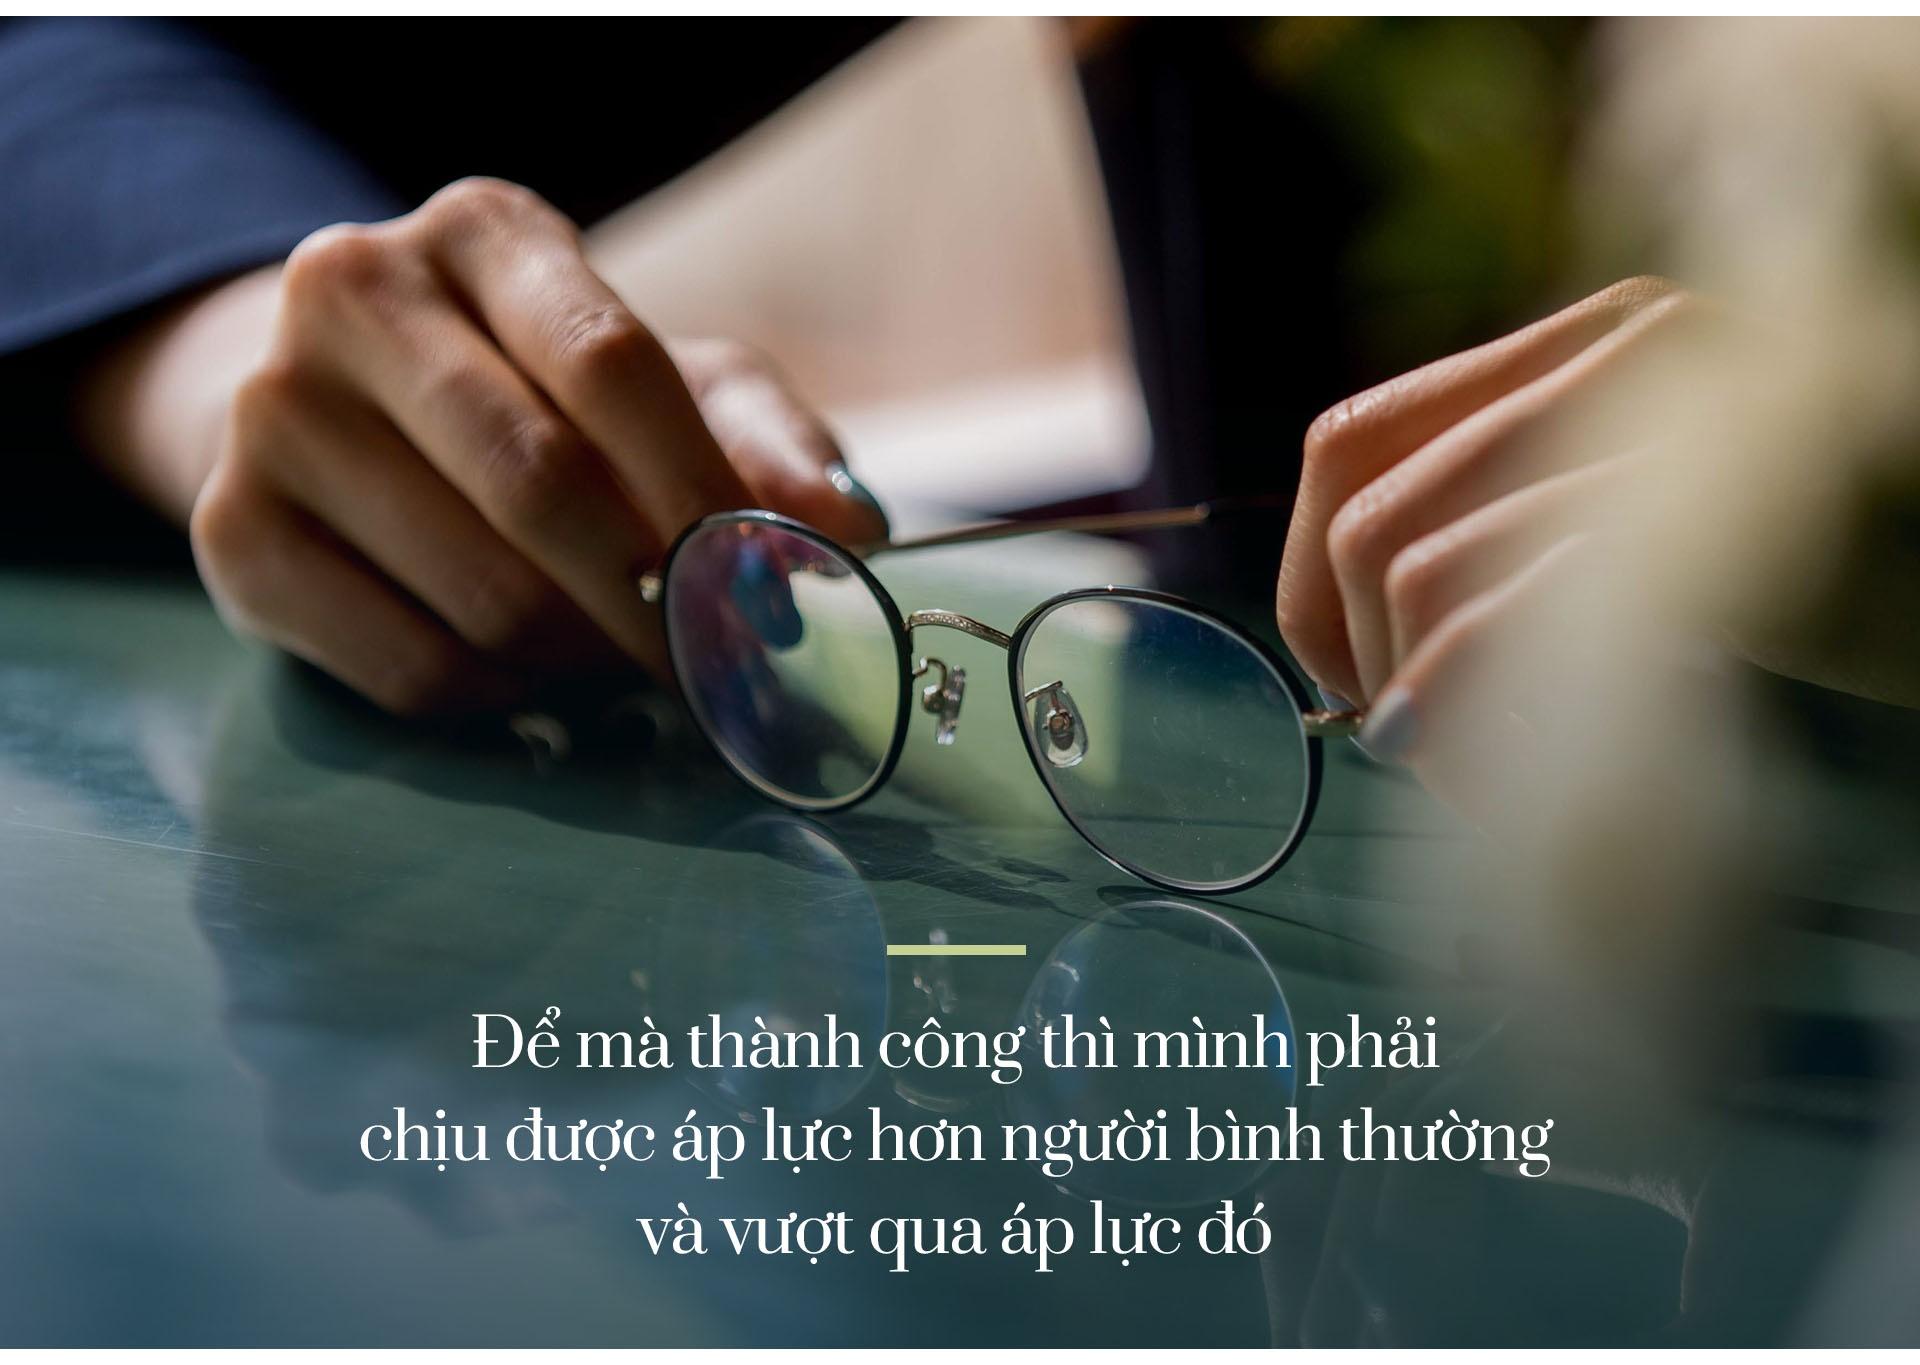 Nguyen Ngoc My: 'Toi khong phai nguoi showbiz, ma lam kinh doanh' hinh anh 7